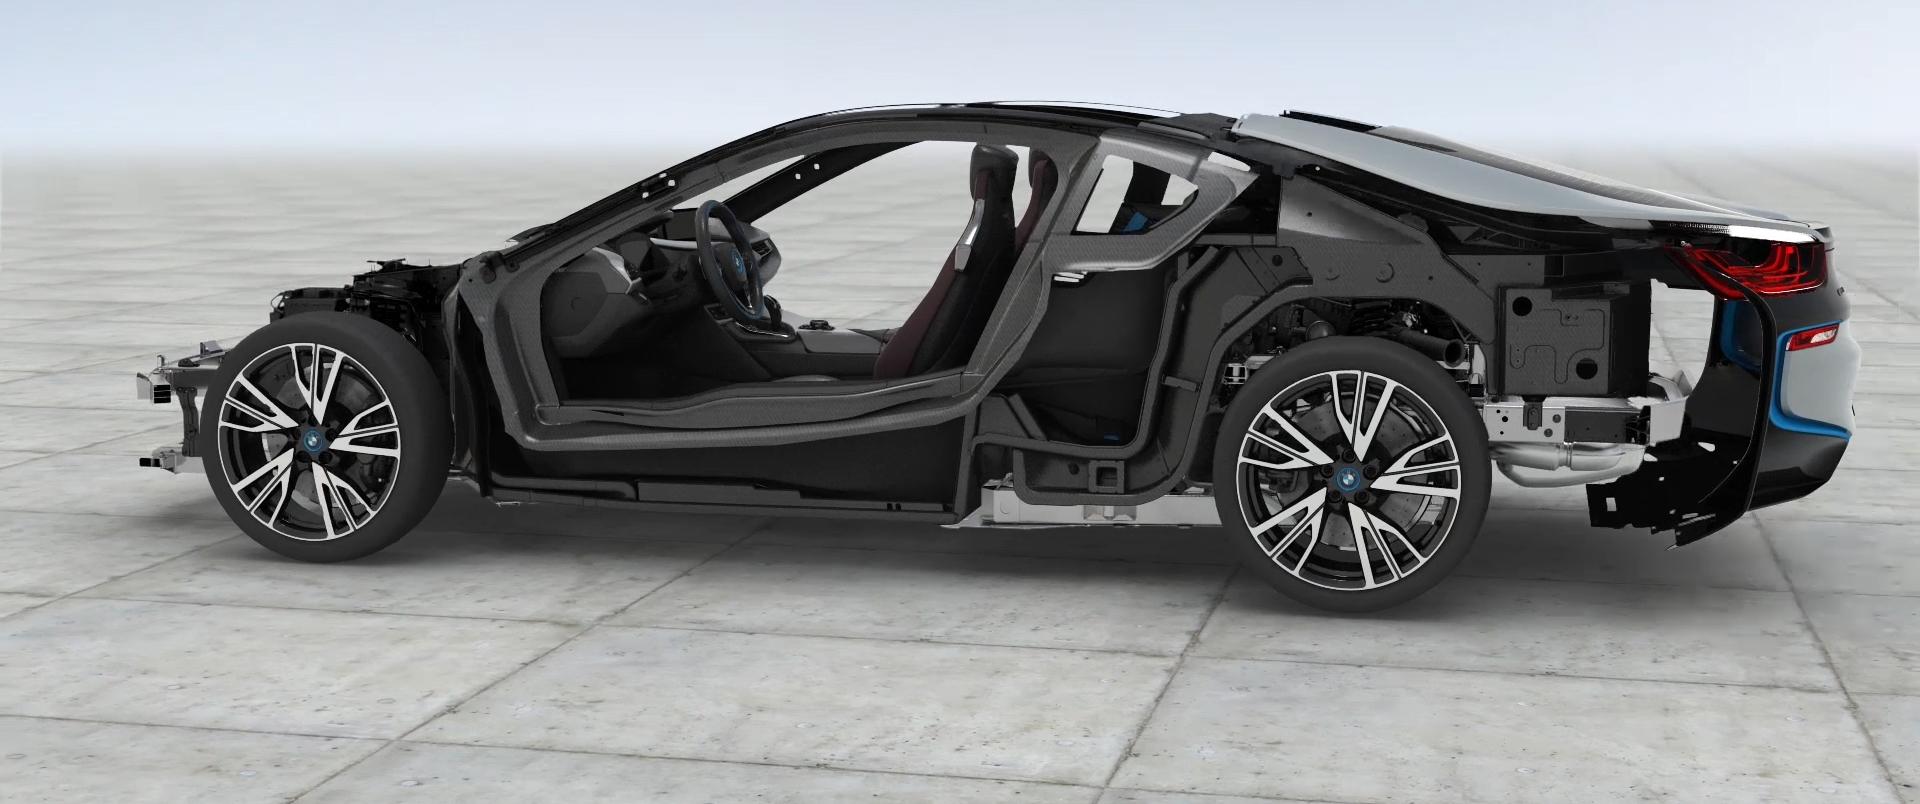 BMW i8 28.jpg